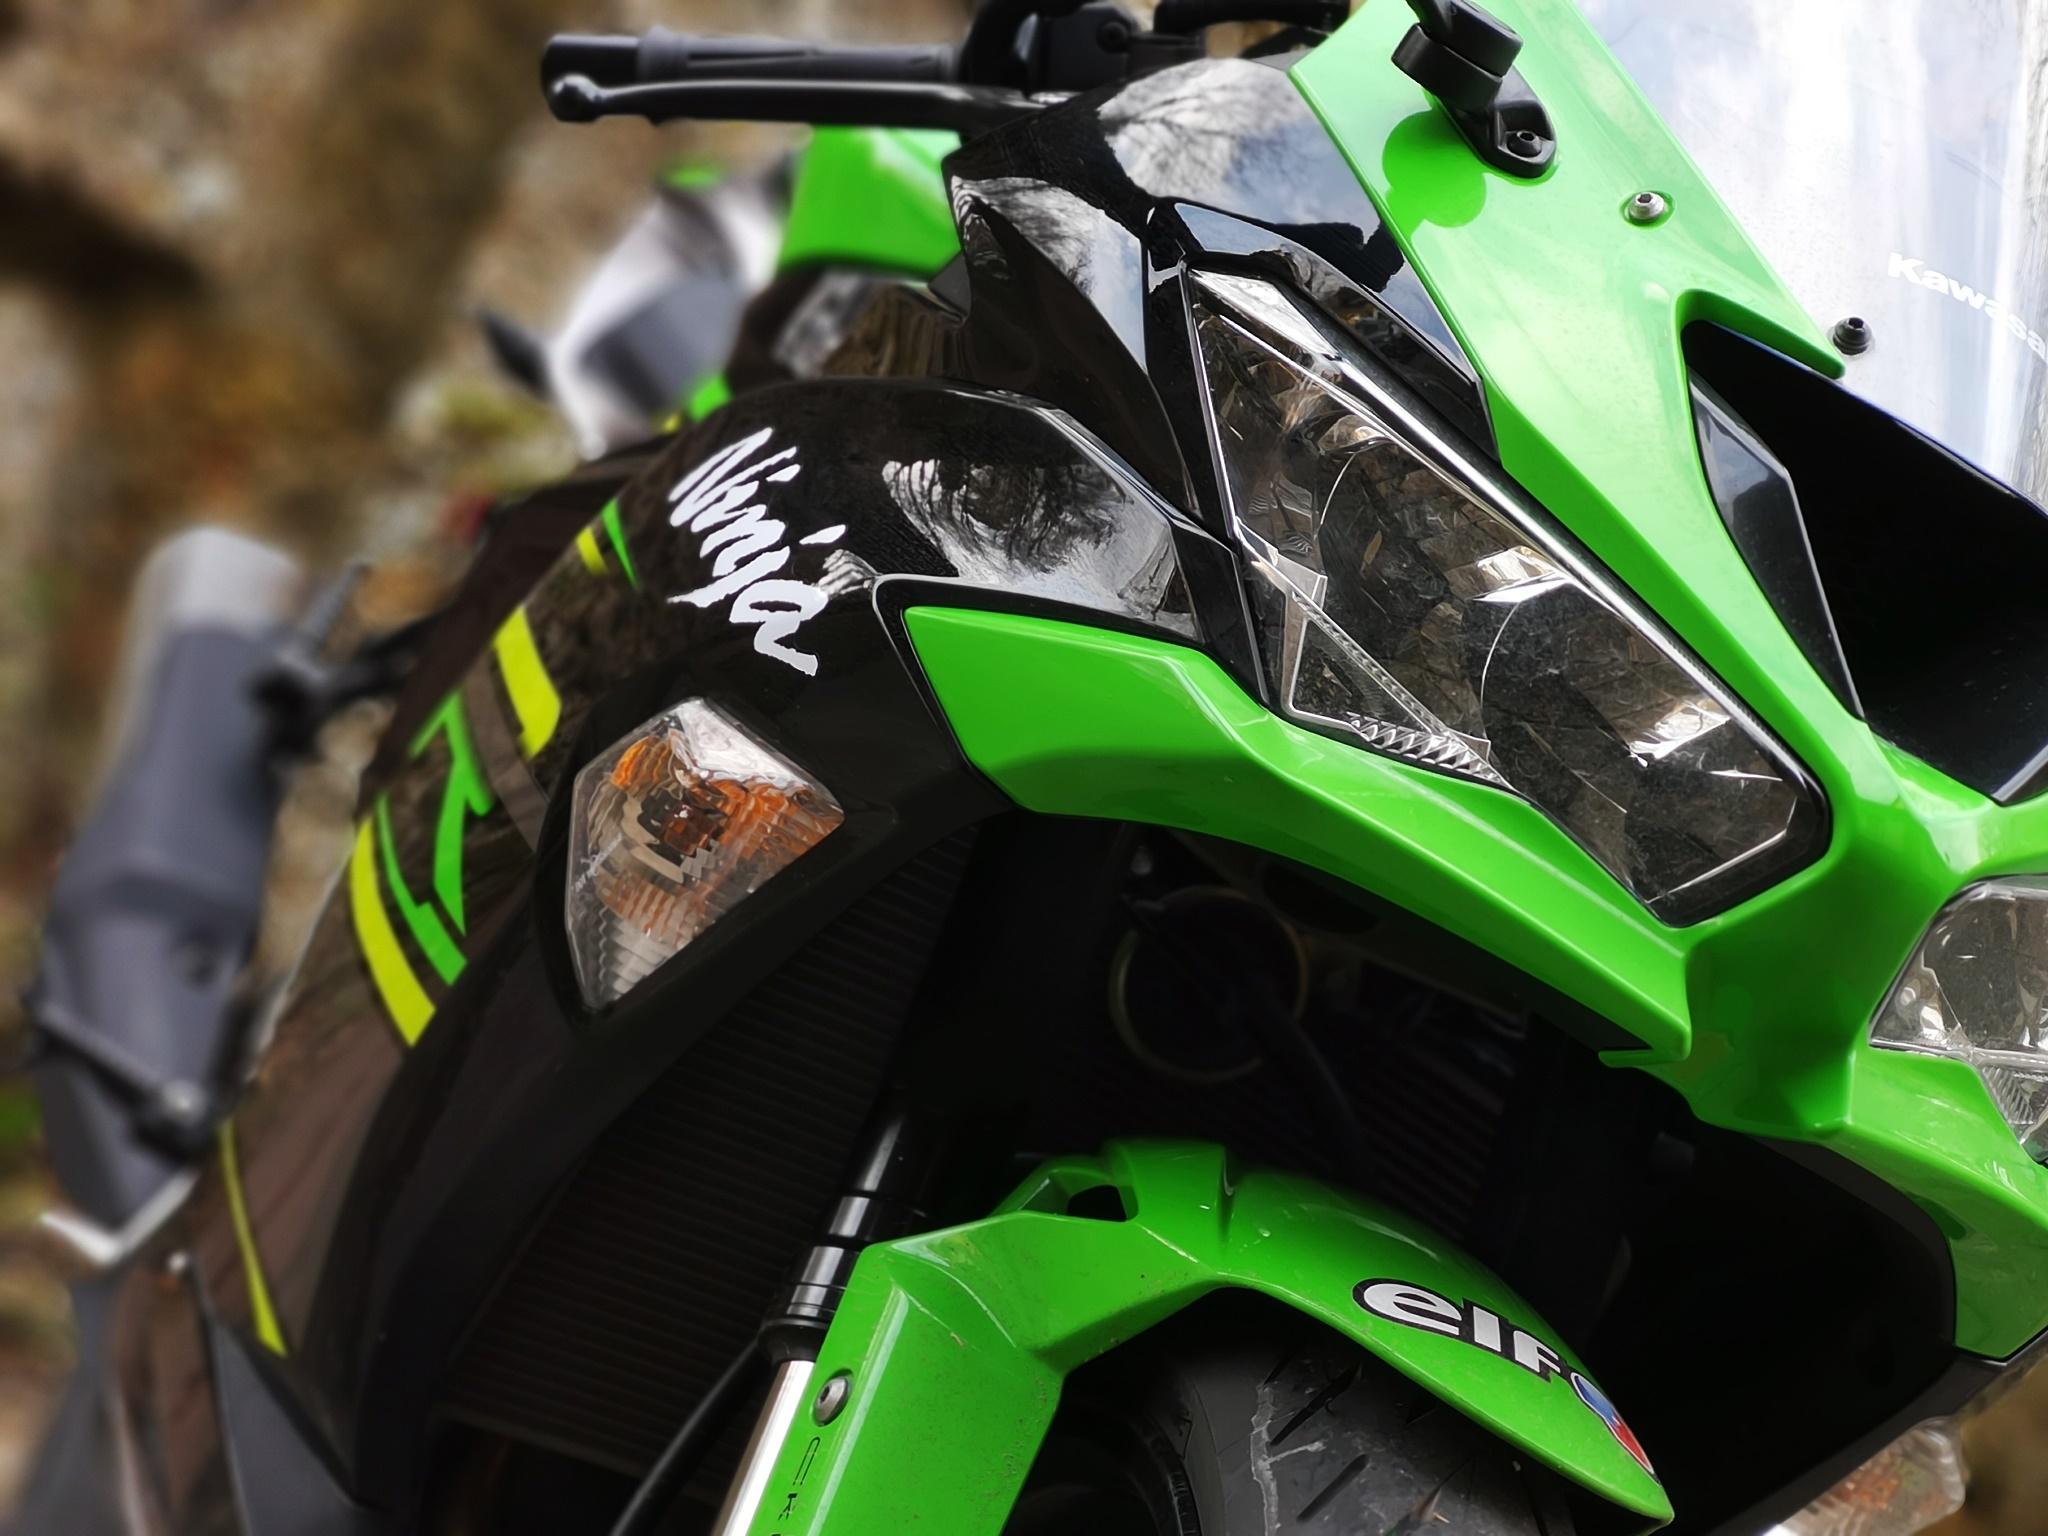 Essai - Kawasaki ZX6-R 636 mod  2019 : passionnément juste !